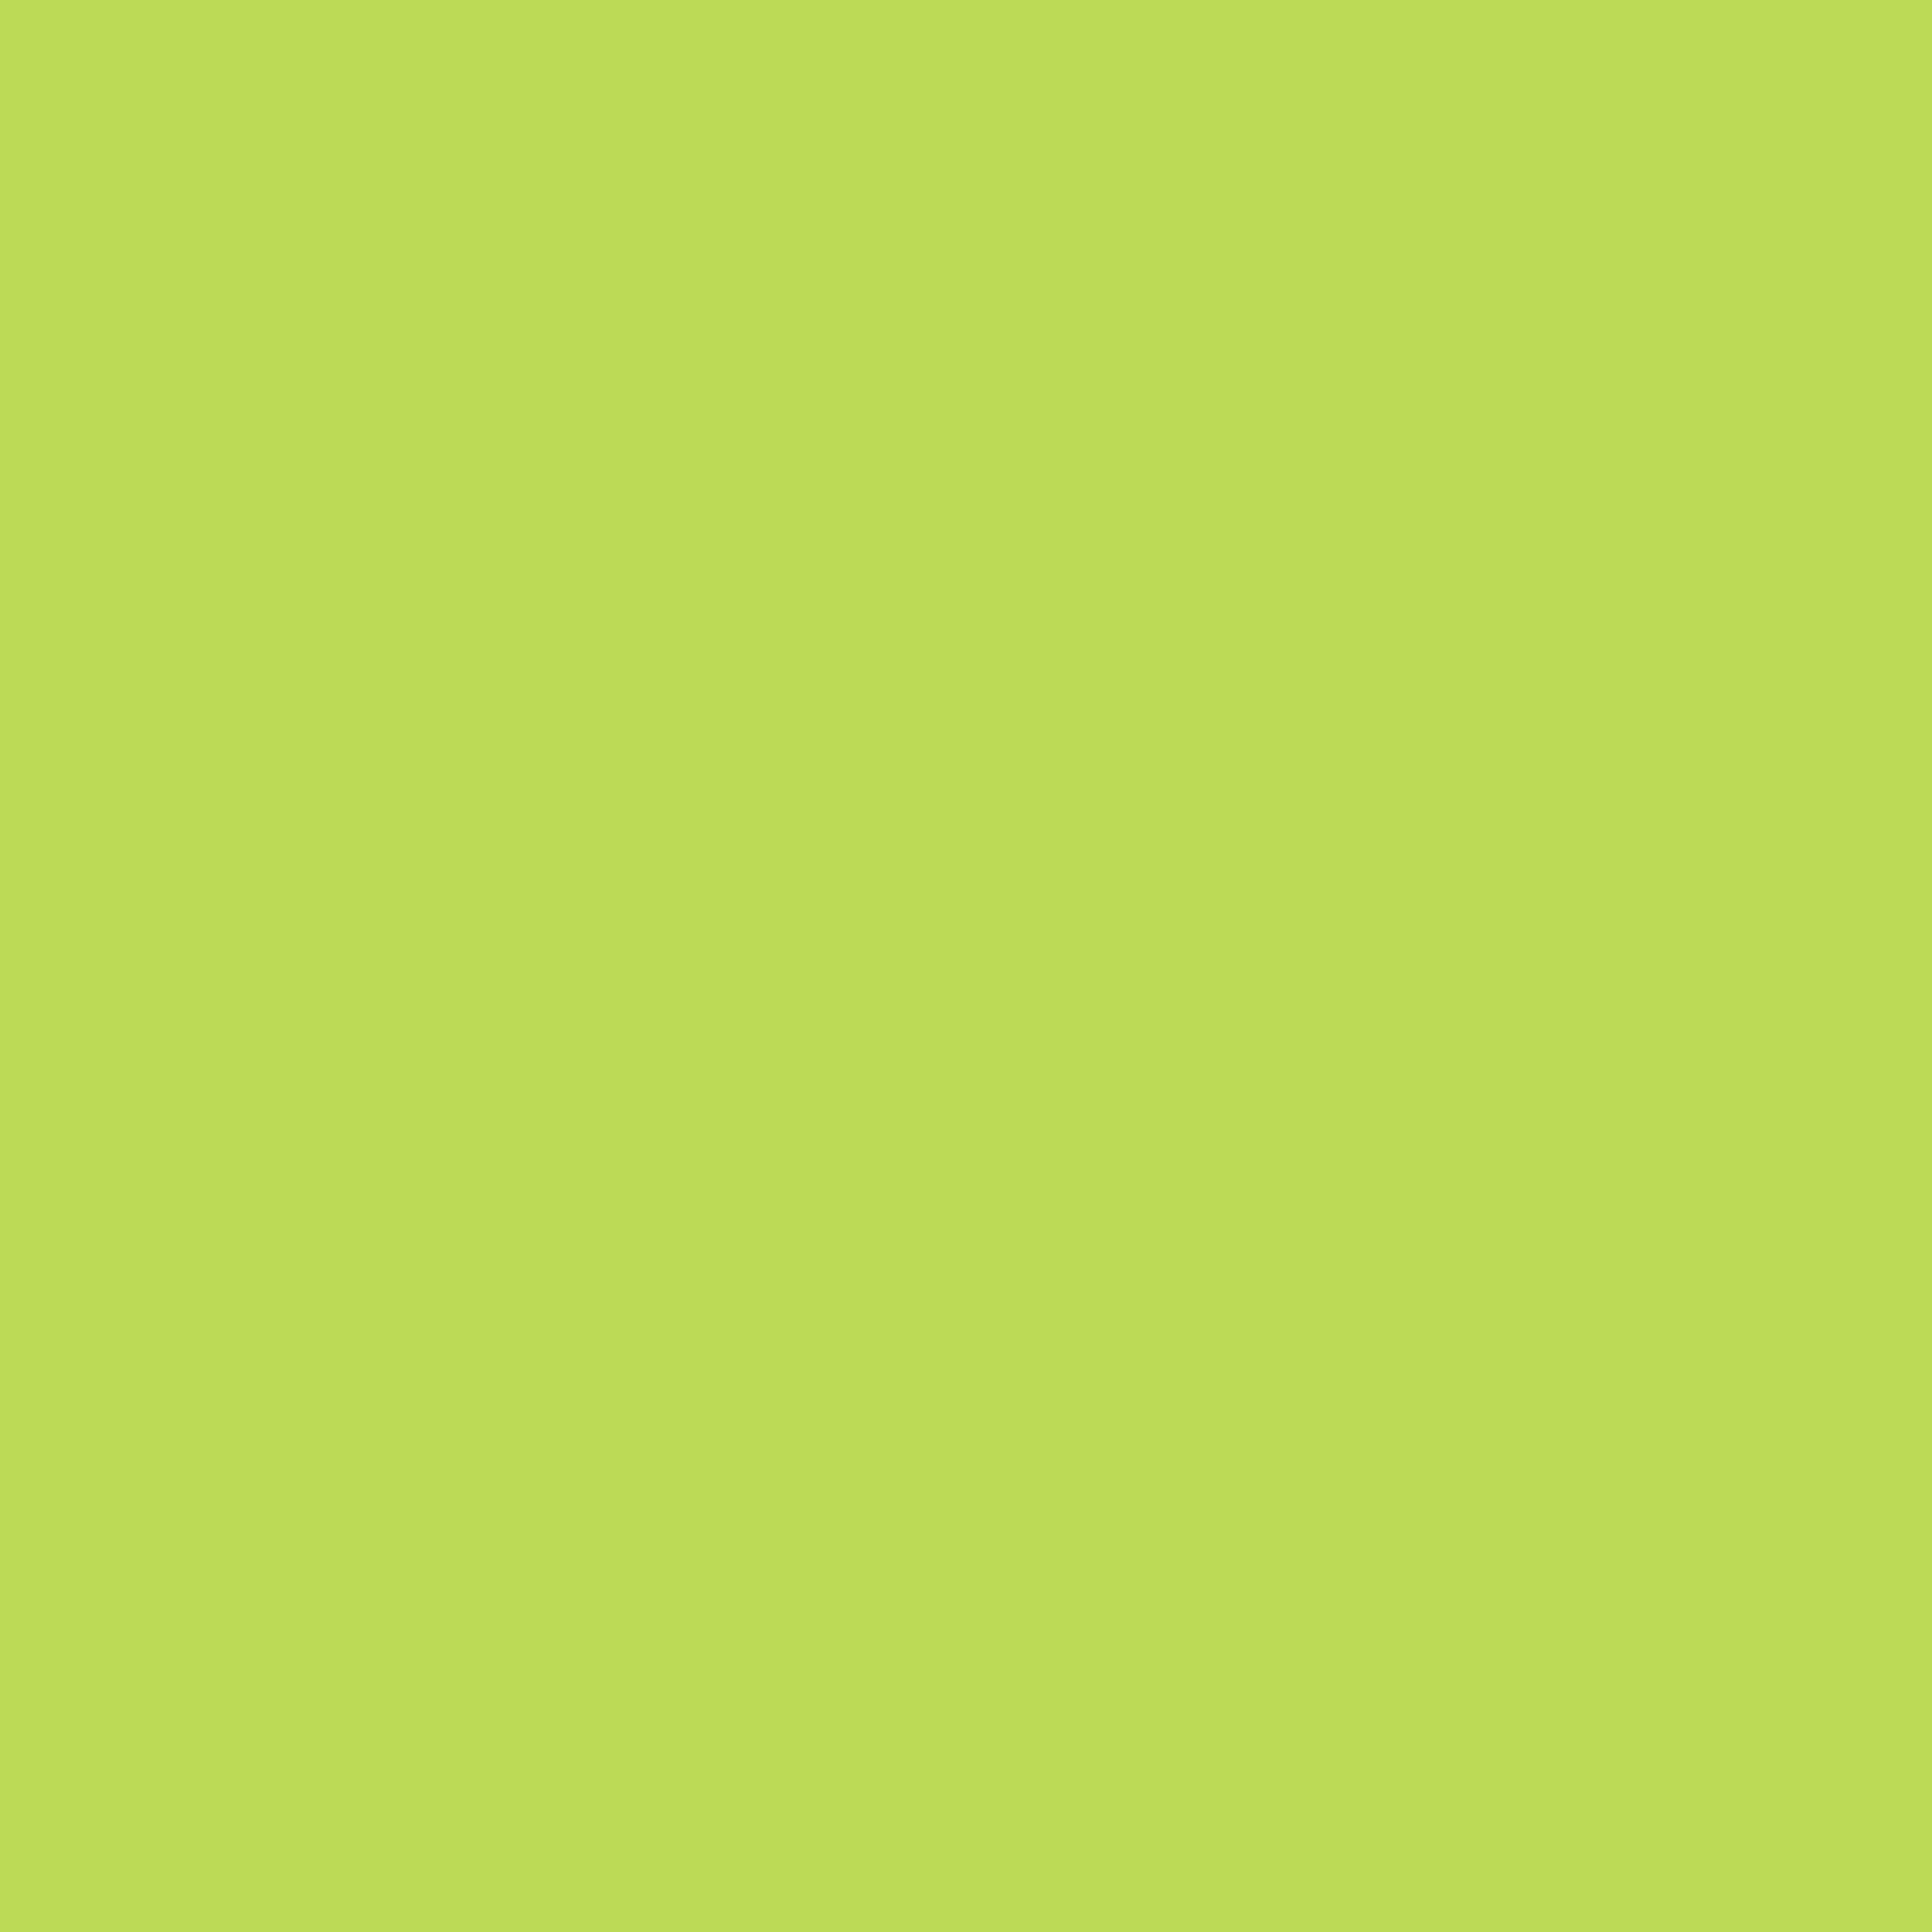 2732x2732 June Bud Solid Color Background